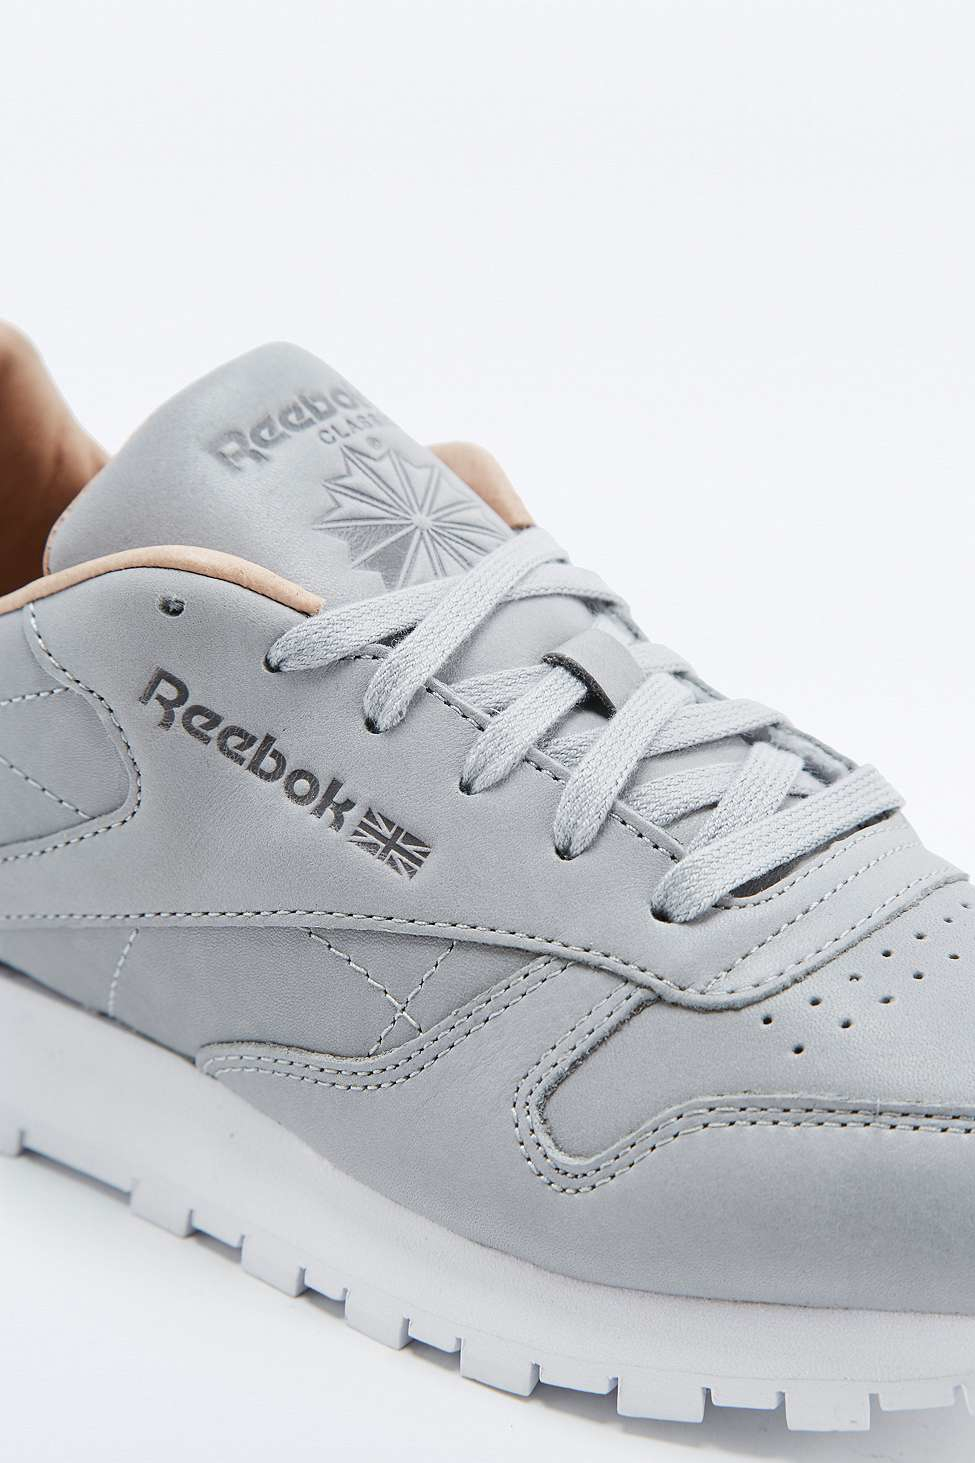 ca423856b93 Reebok Classic Premium Grey Trainers in Gray - Lyst